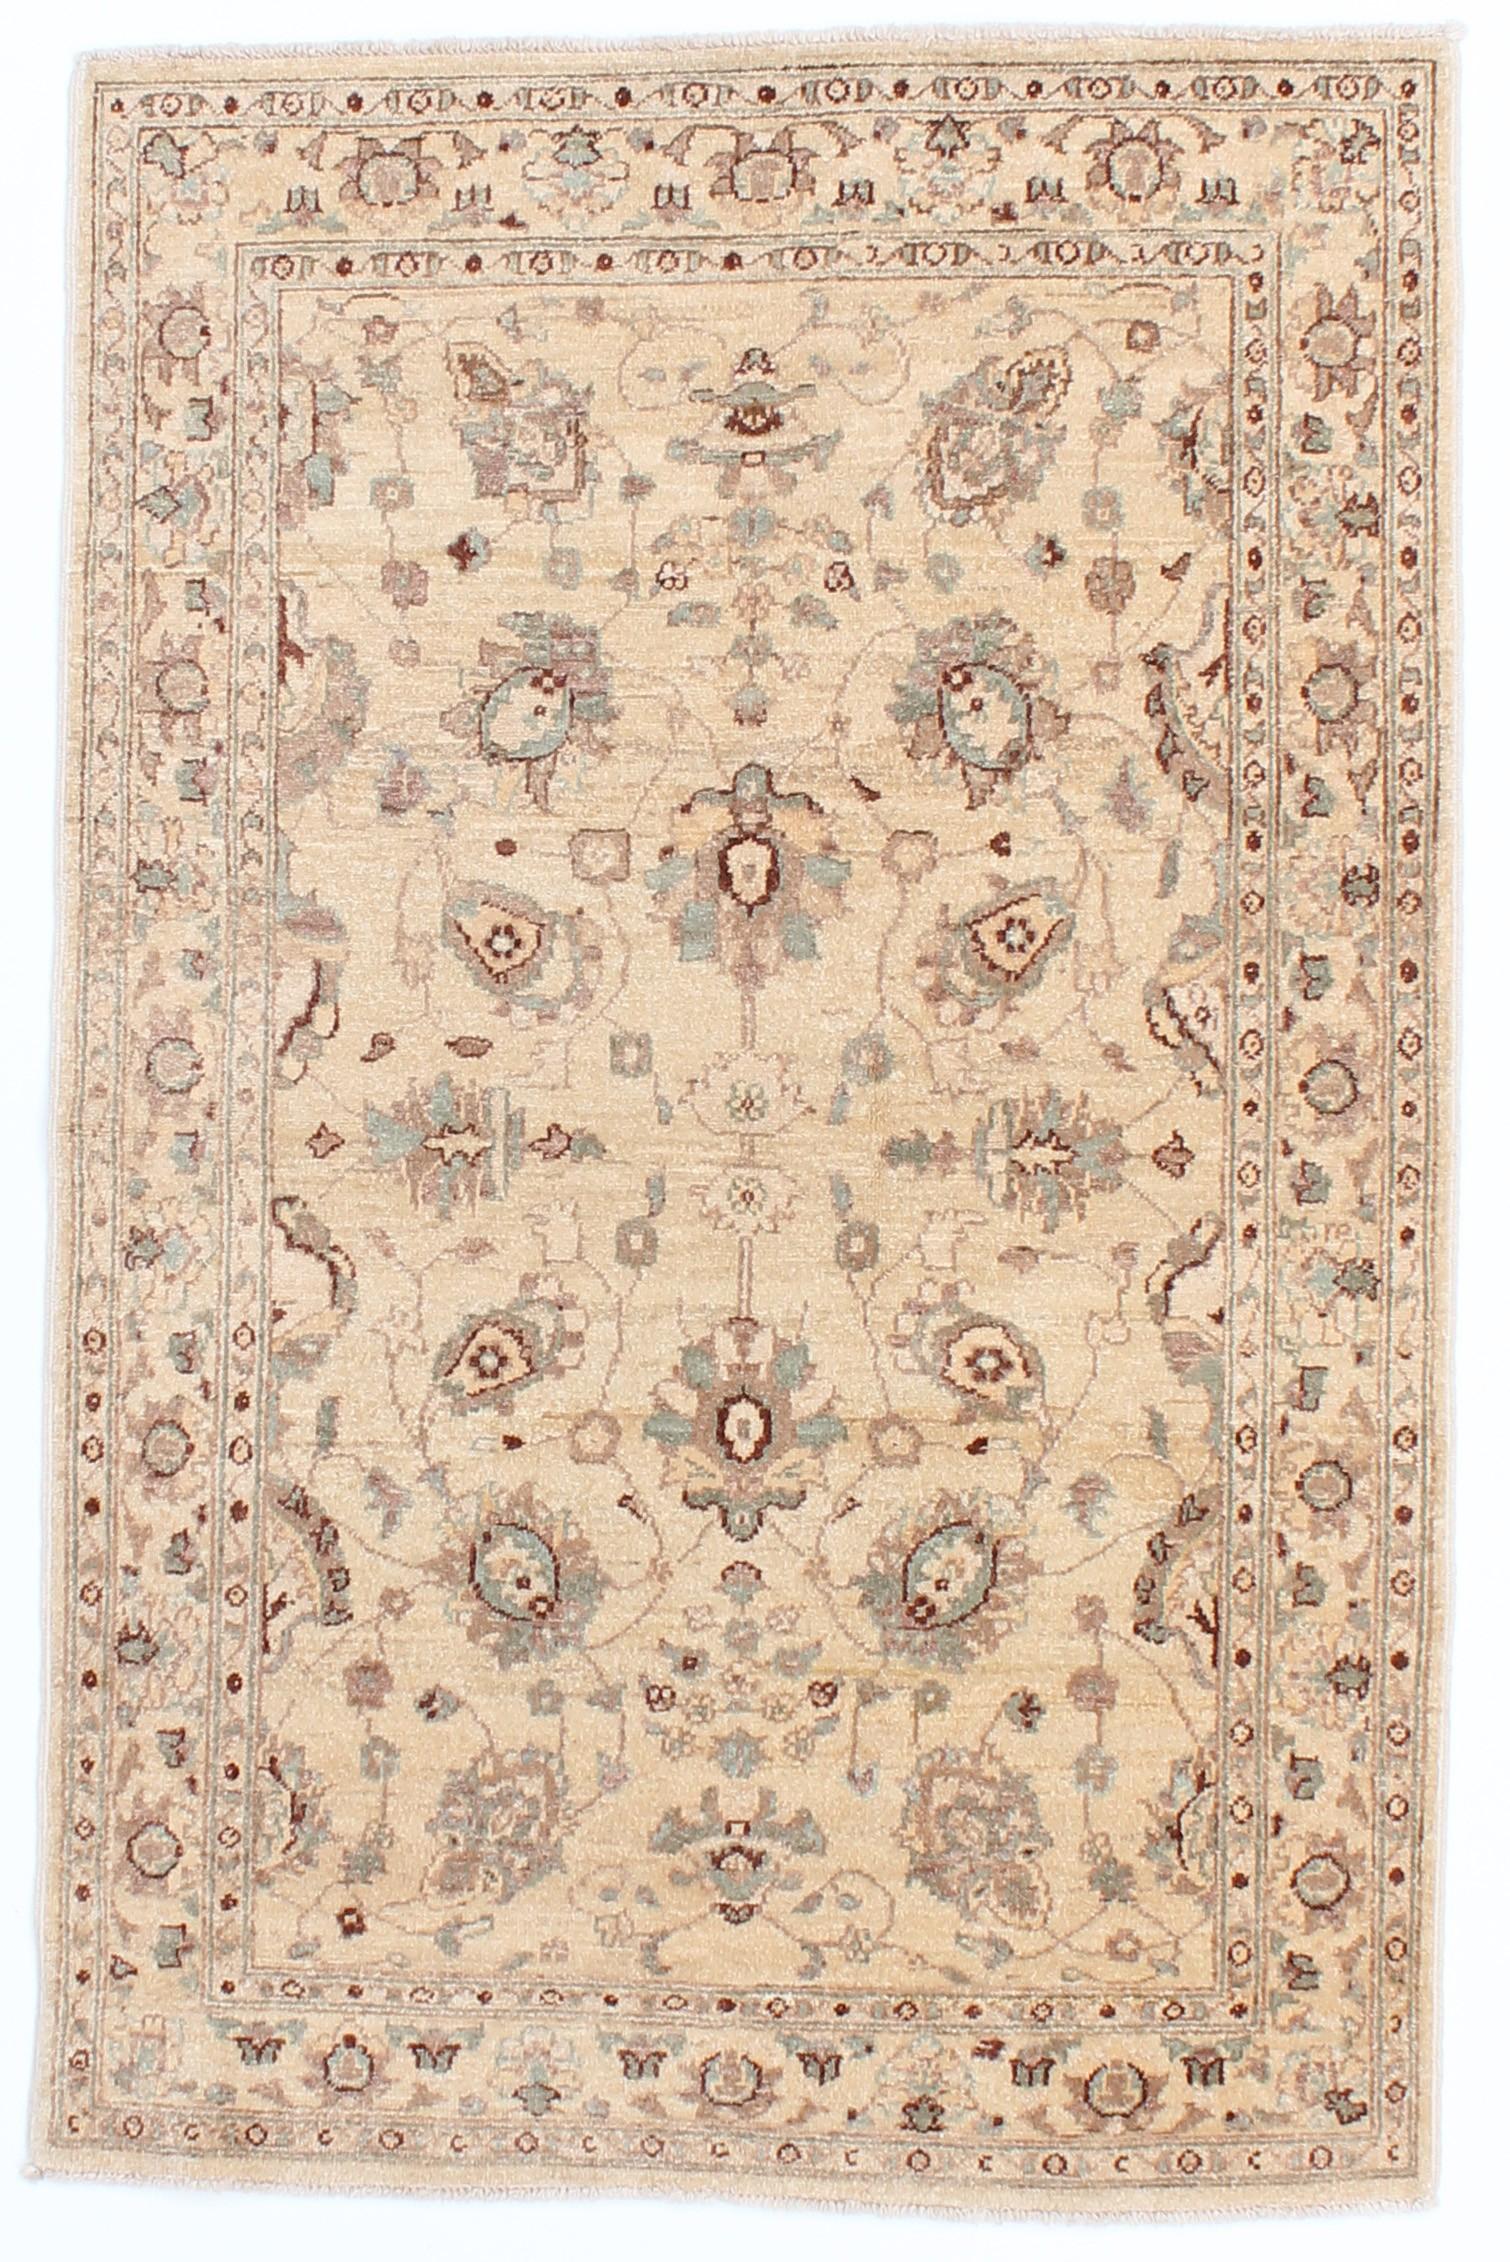 teppich k nig bonn teppiche bonn schone bonn einen zu verlegen with teppiche bonn perfect art. Black Bedroom Furniture Sets. Home Design Ideas